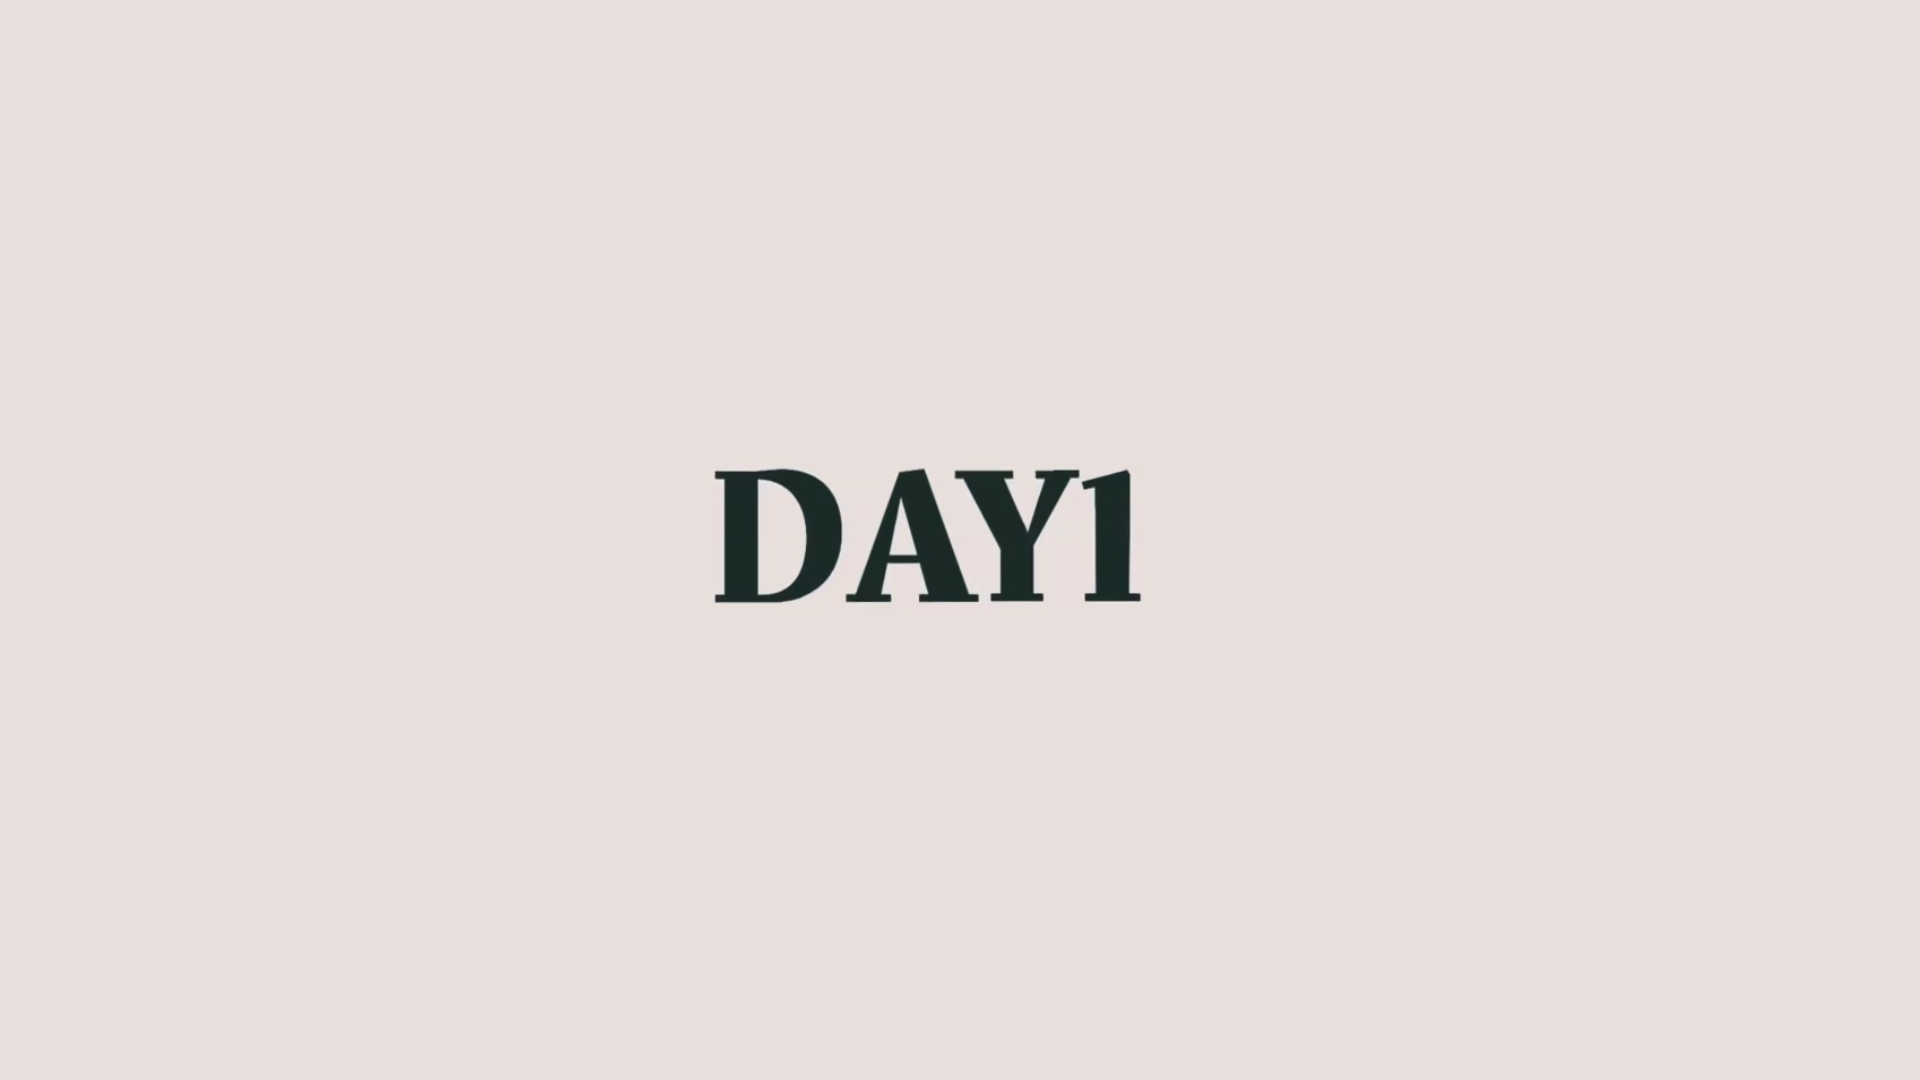 【Daily音声SNS】DAY1-02作成したものを解説